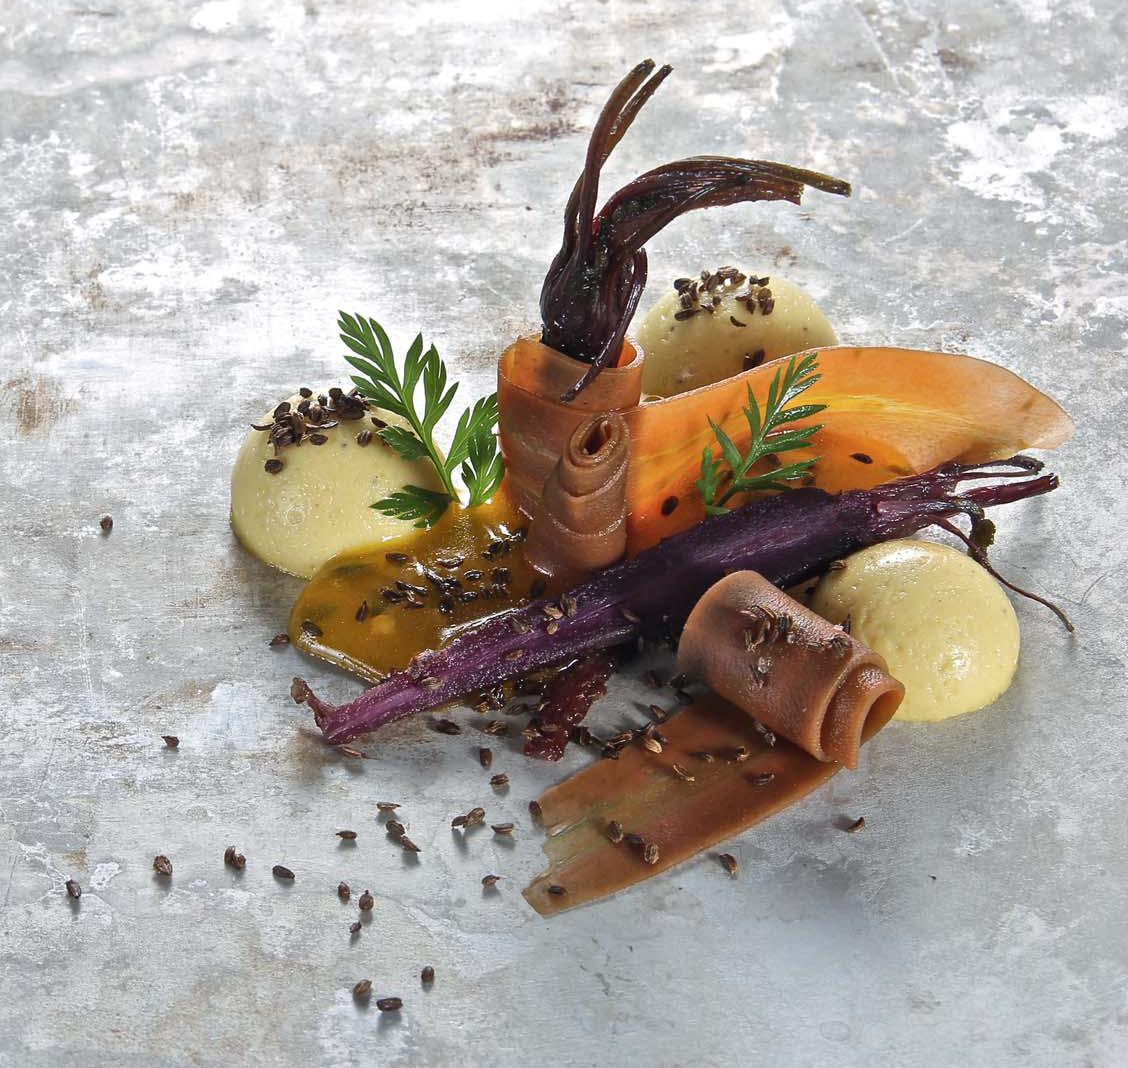 Karotte in Texturen, Apfel, Maracuja, Christian Mittermeier